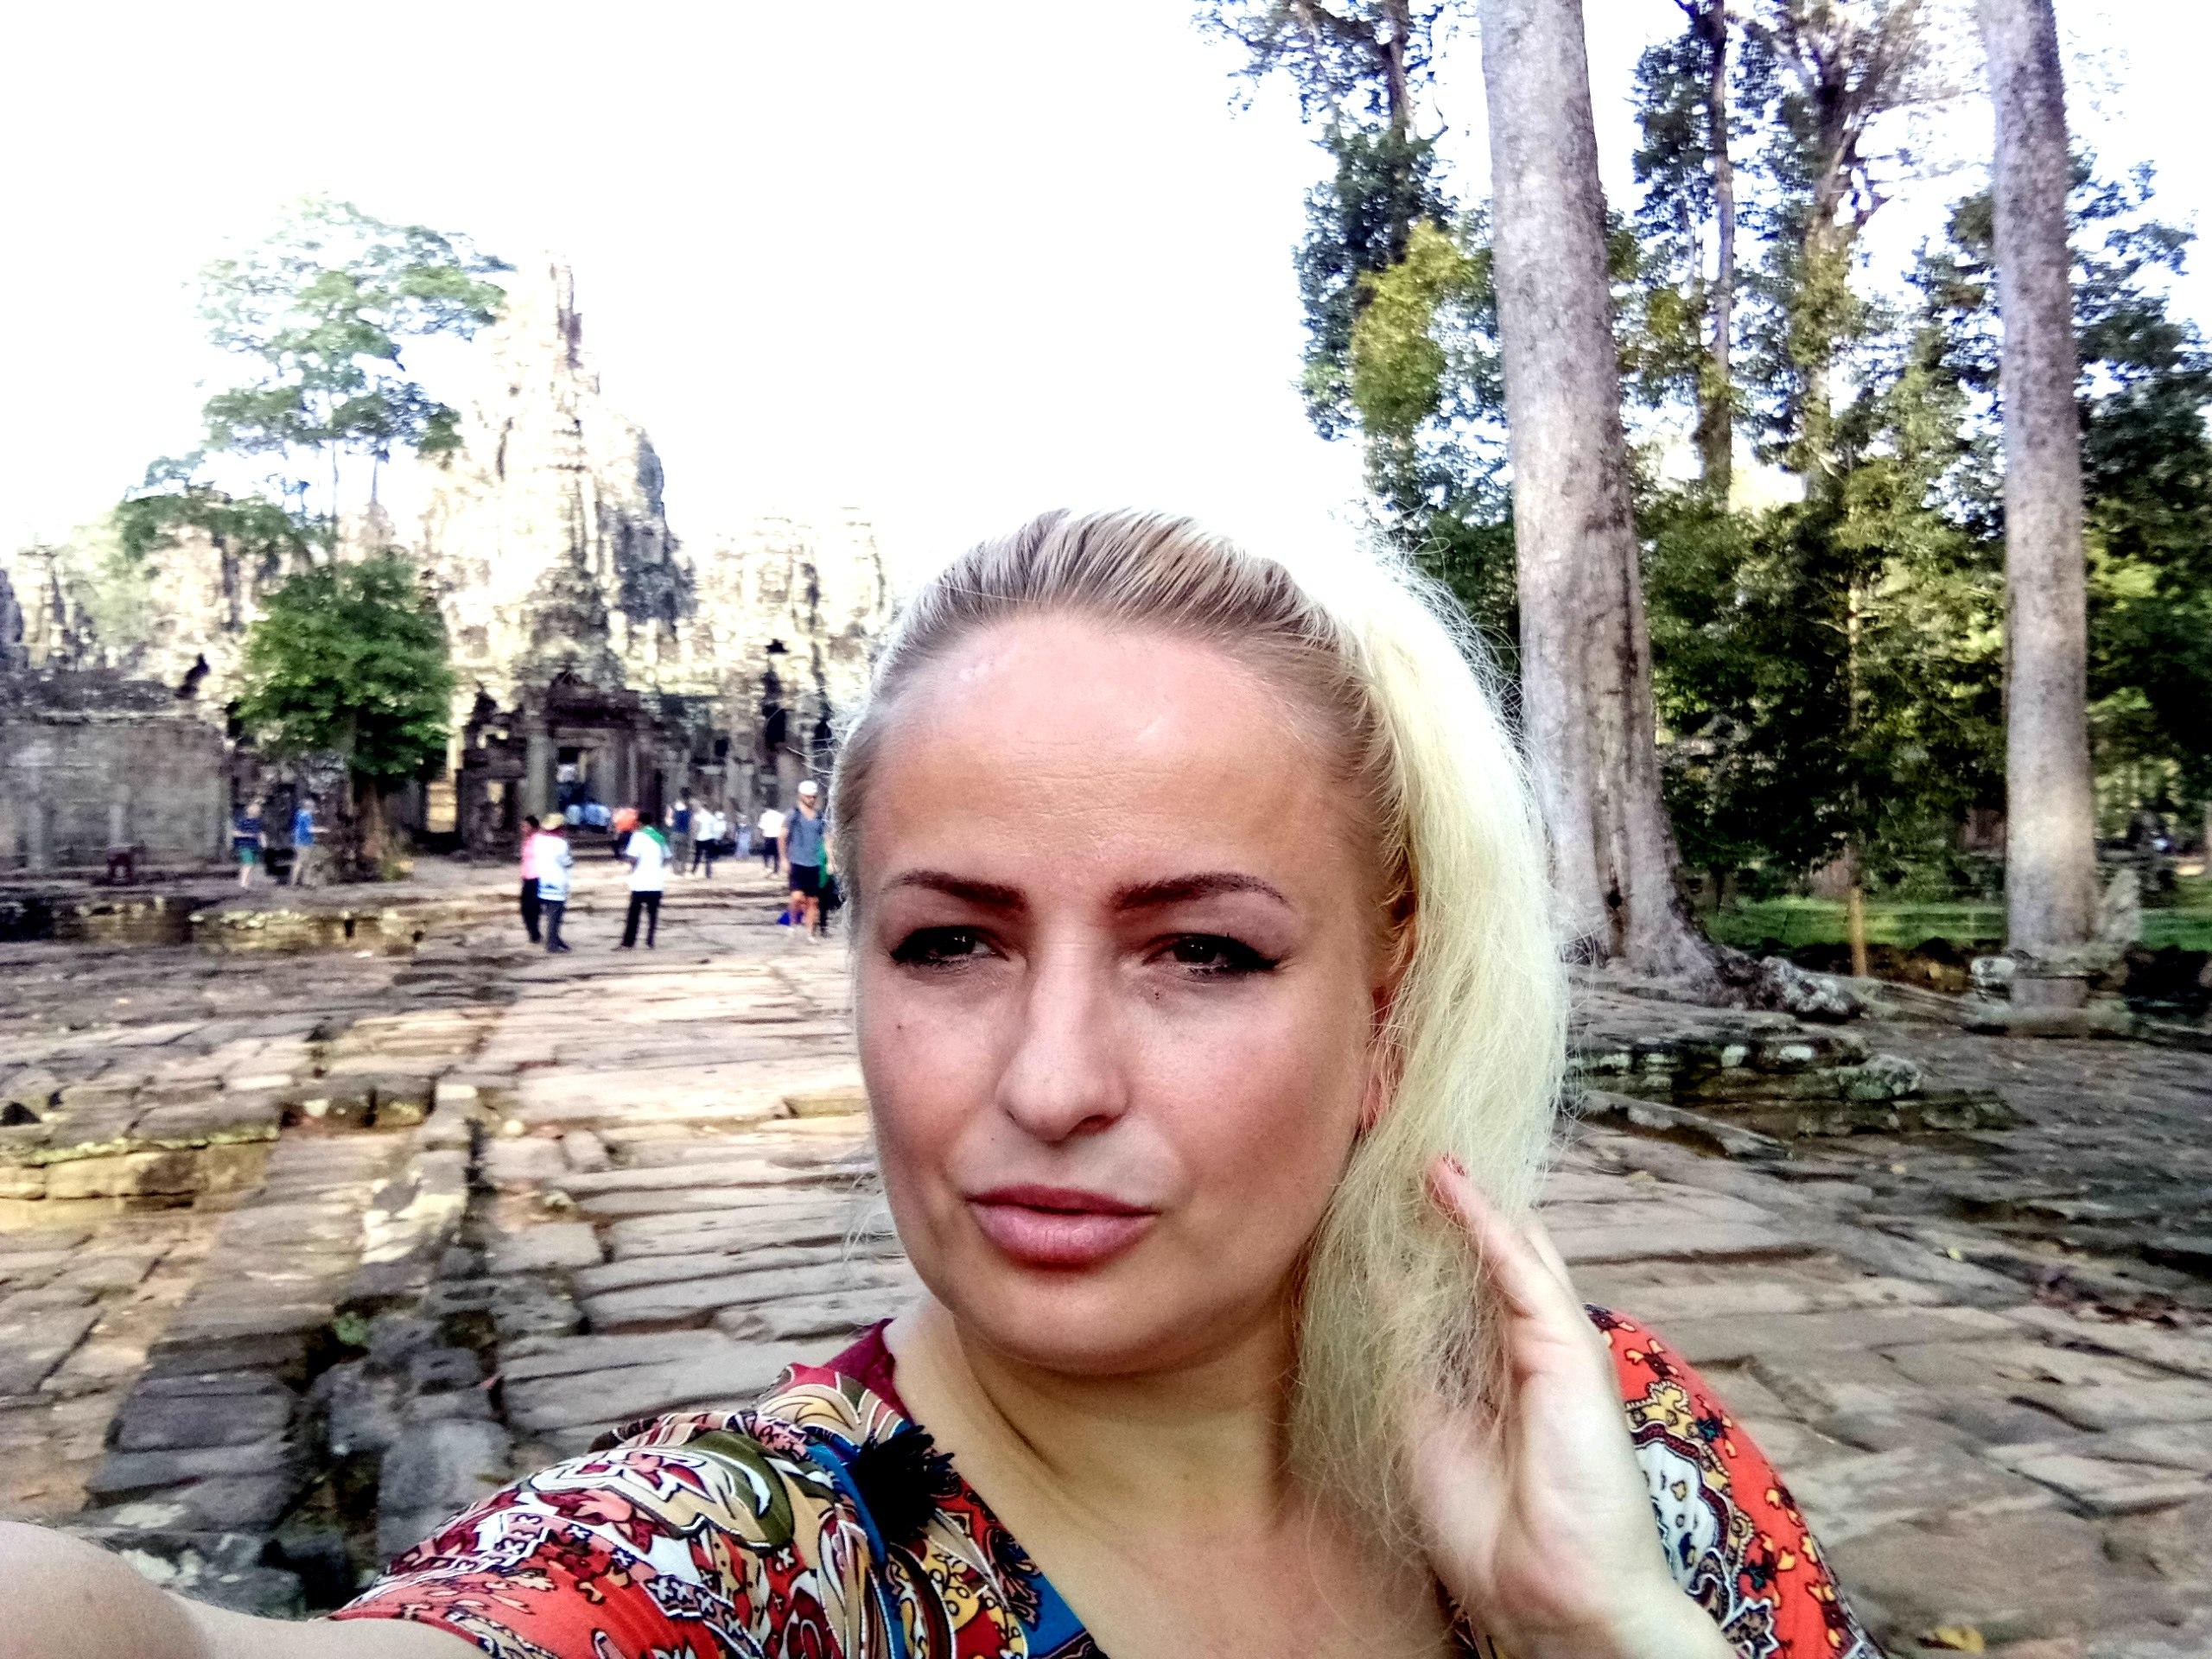 Елена Руденко (Валтея). Камбоджа. Ангкор. - Страница 2 QyIMfUTe9bU